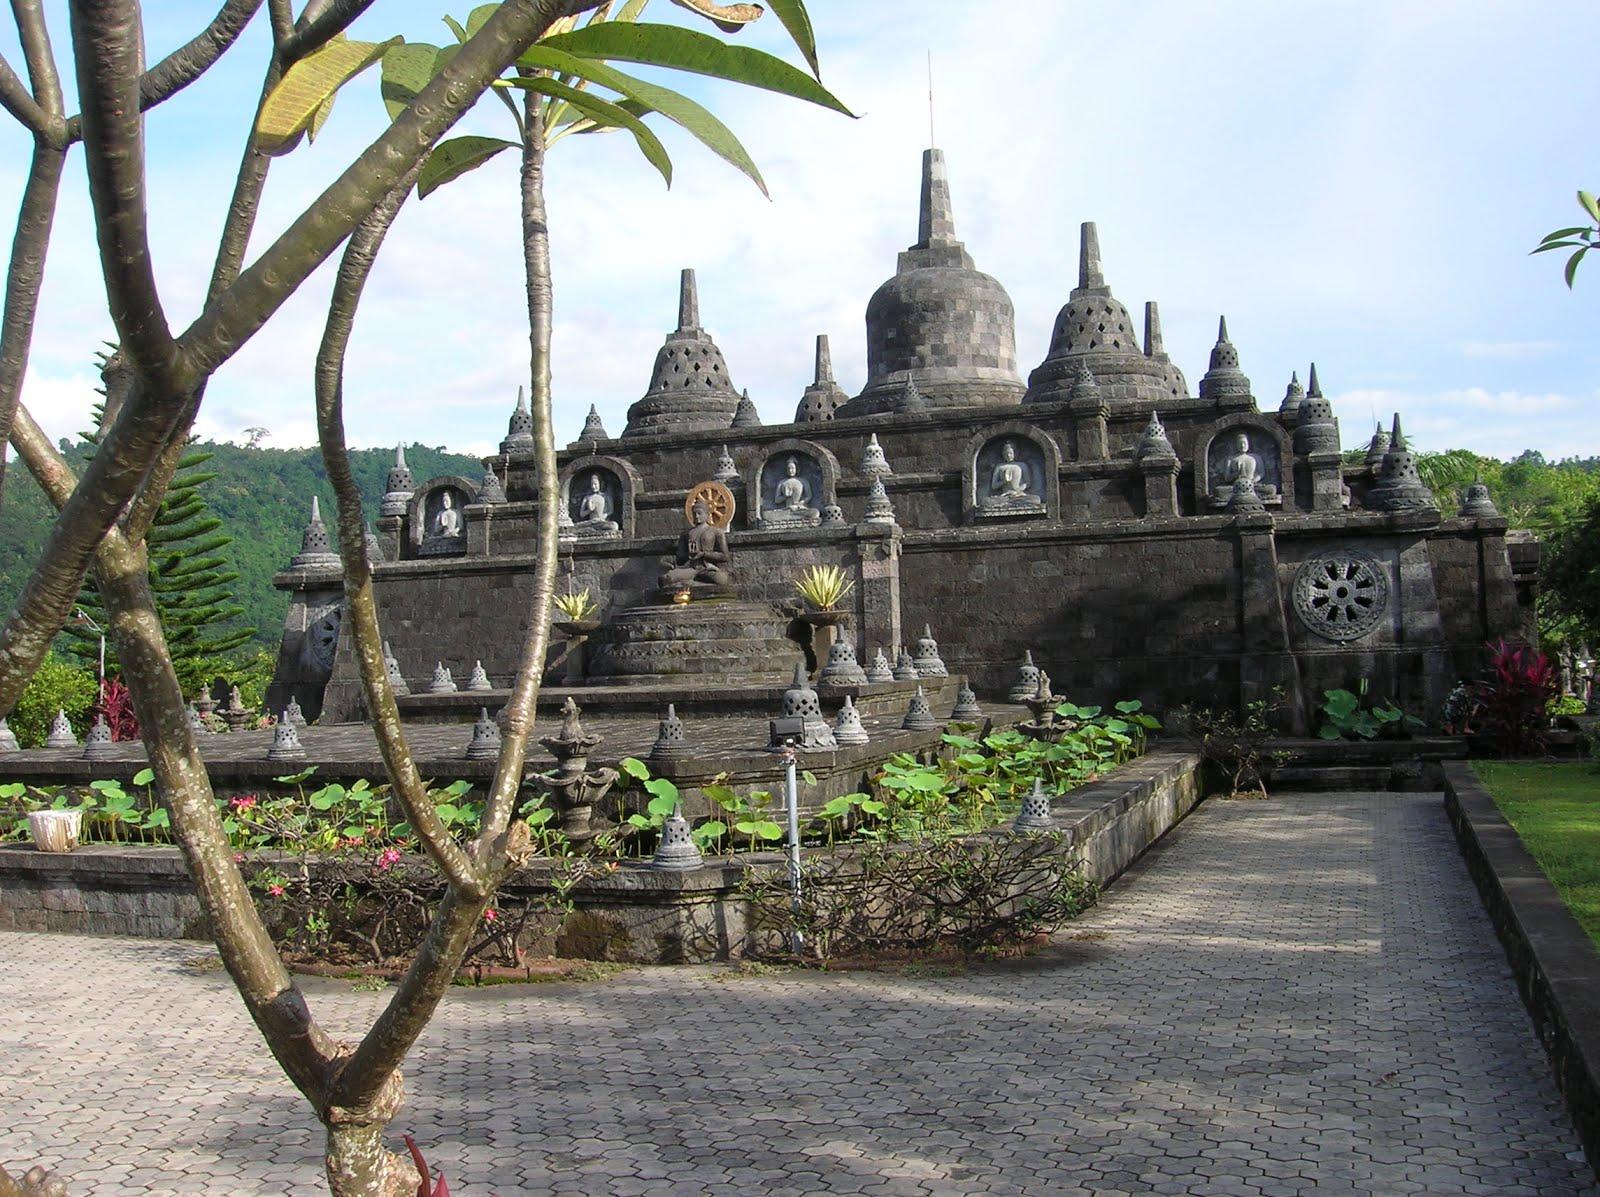 templo budista de Brahma Vihara Arama, Bali, vuelta al mundo, round the world, La vuelta al mundo de Asun y Ricardo